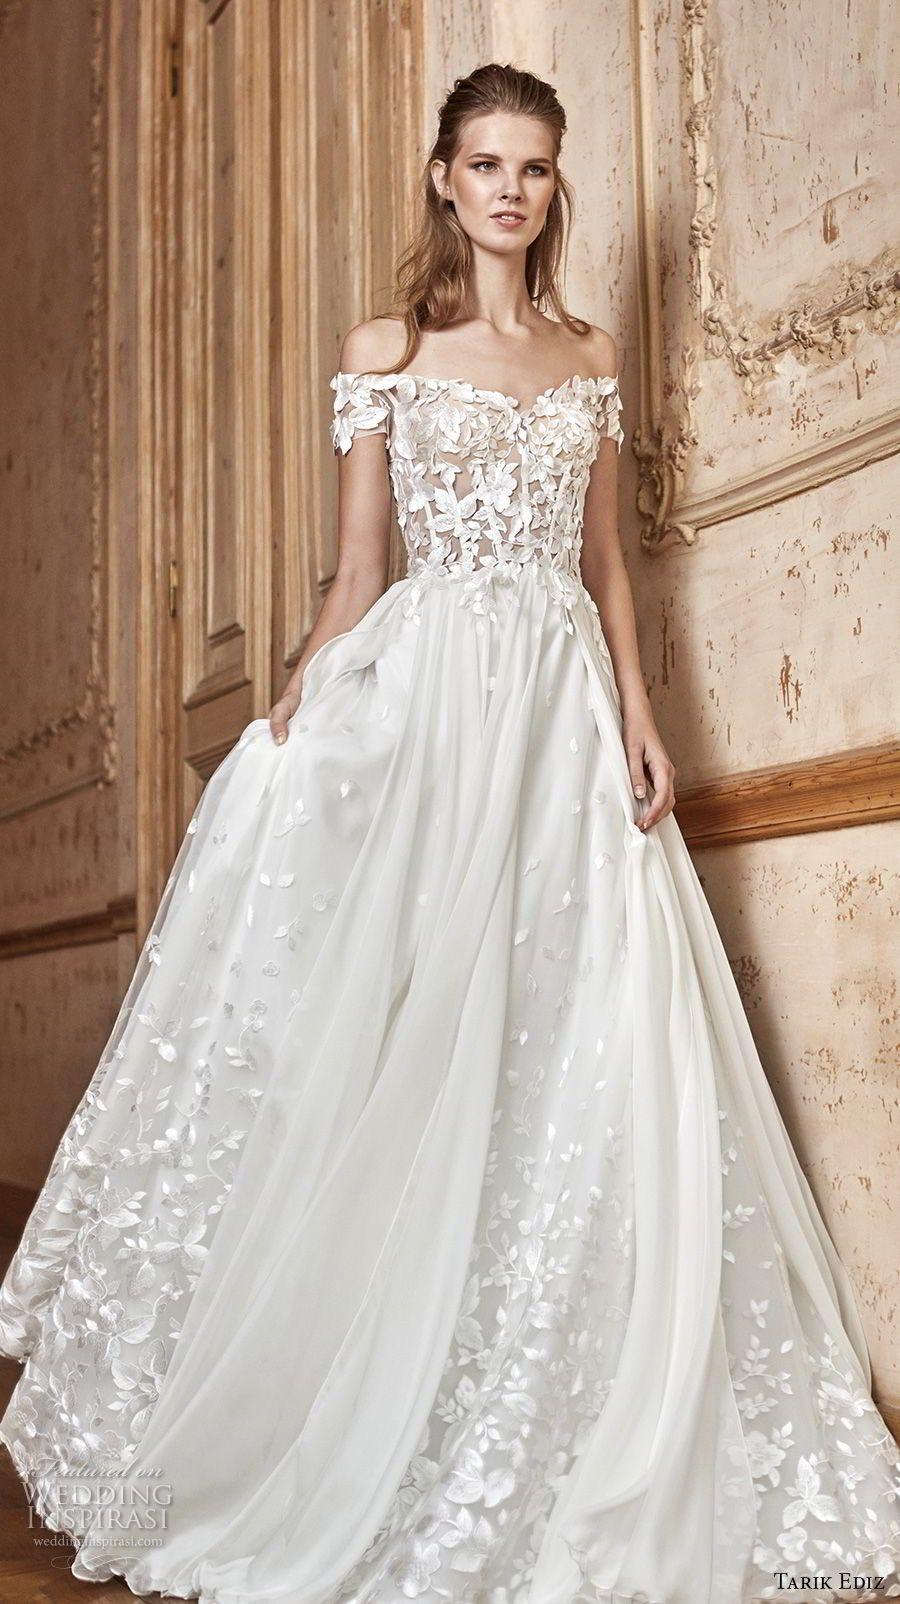 Tarik Ediz 2017 Bridal Off The Shoulder Sweetheart Neckline Heavily Embellished Bodice A Line Wedding Dress 28 Mv White